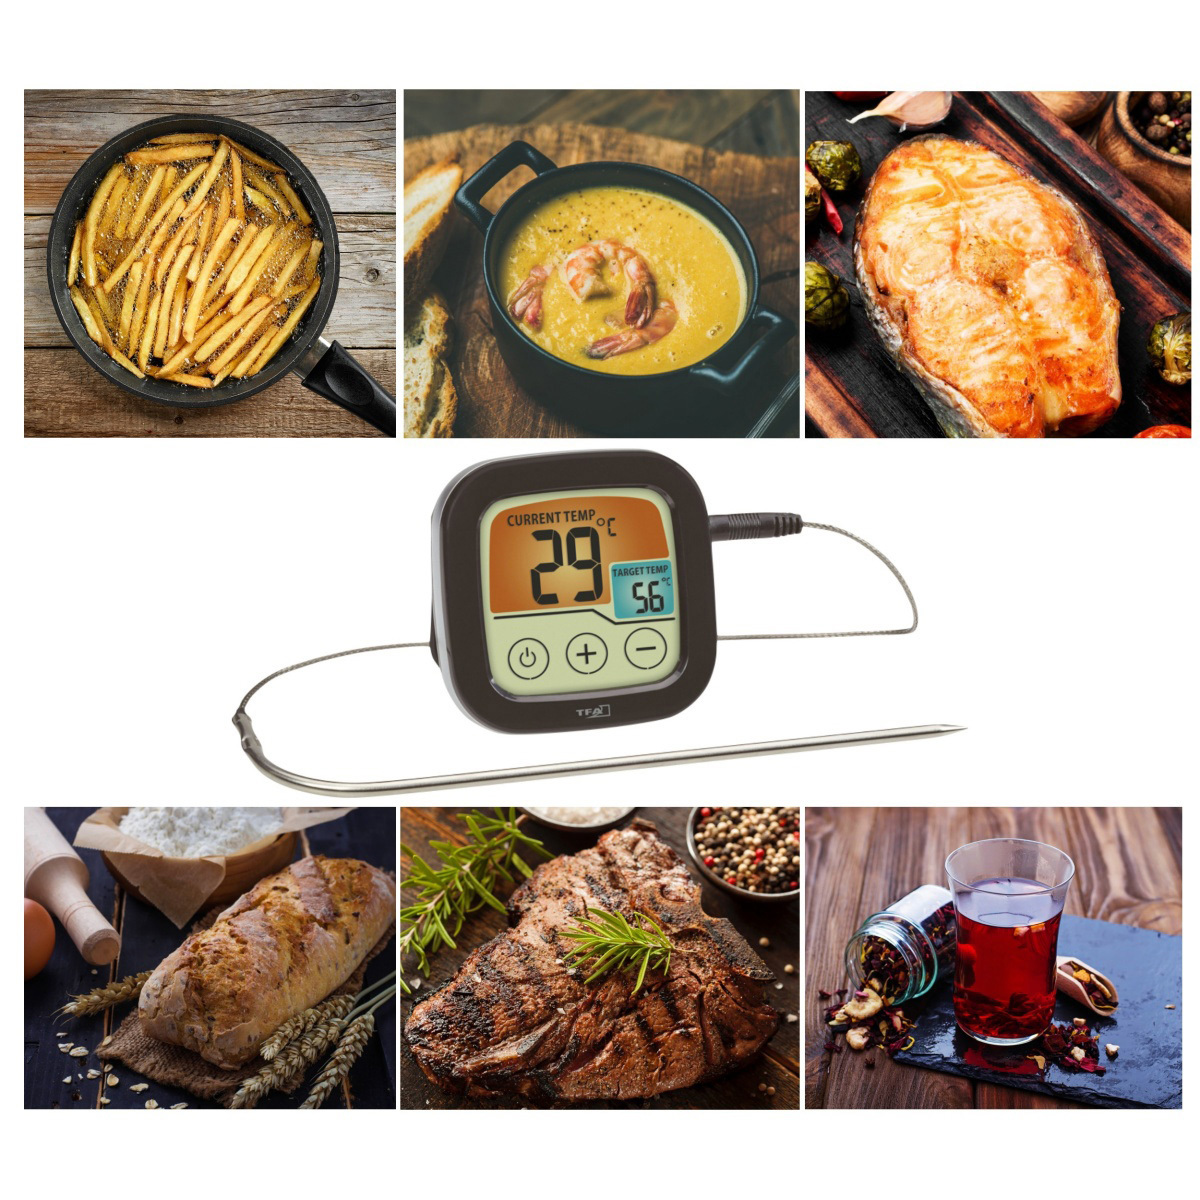 14-1509-01-digitales-grill-bratenthermometer-anwendung-1200x1200px.jpg